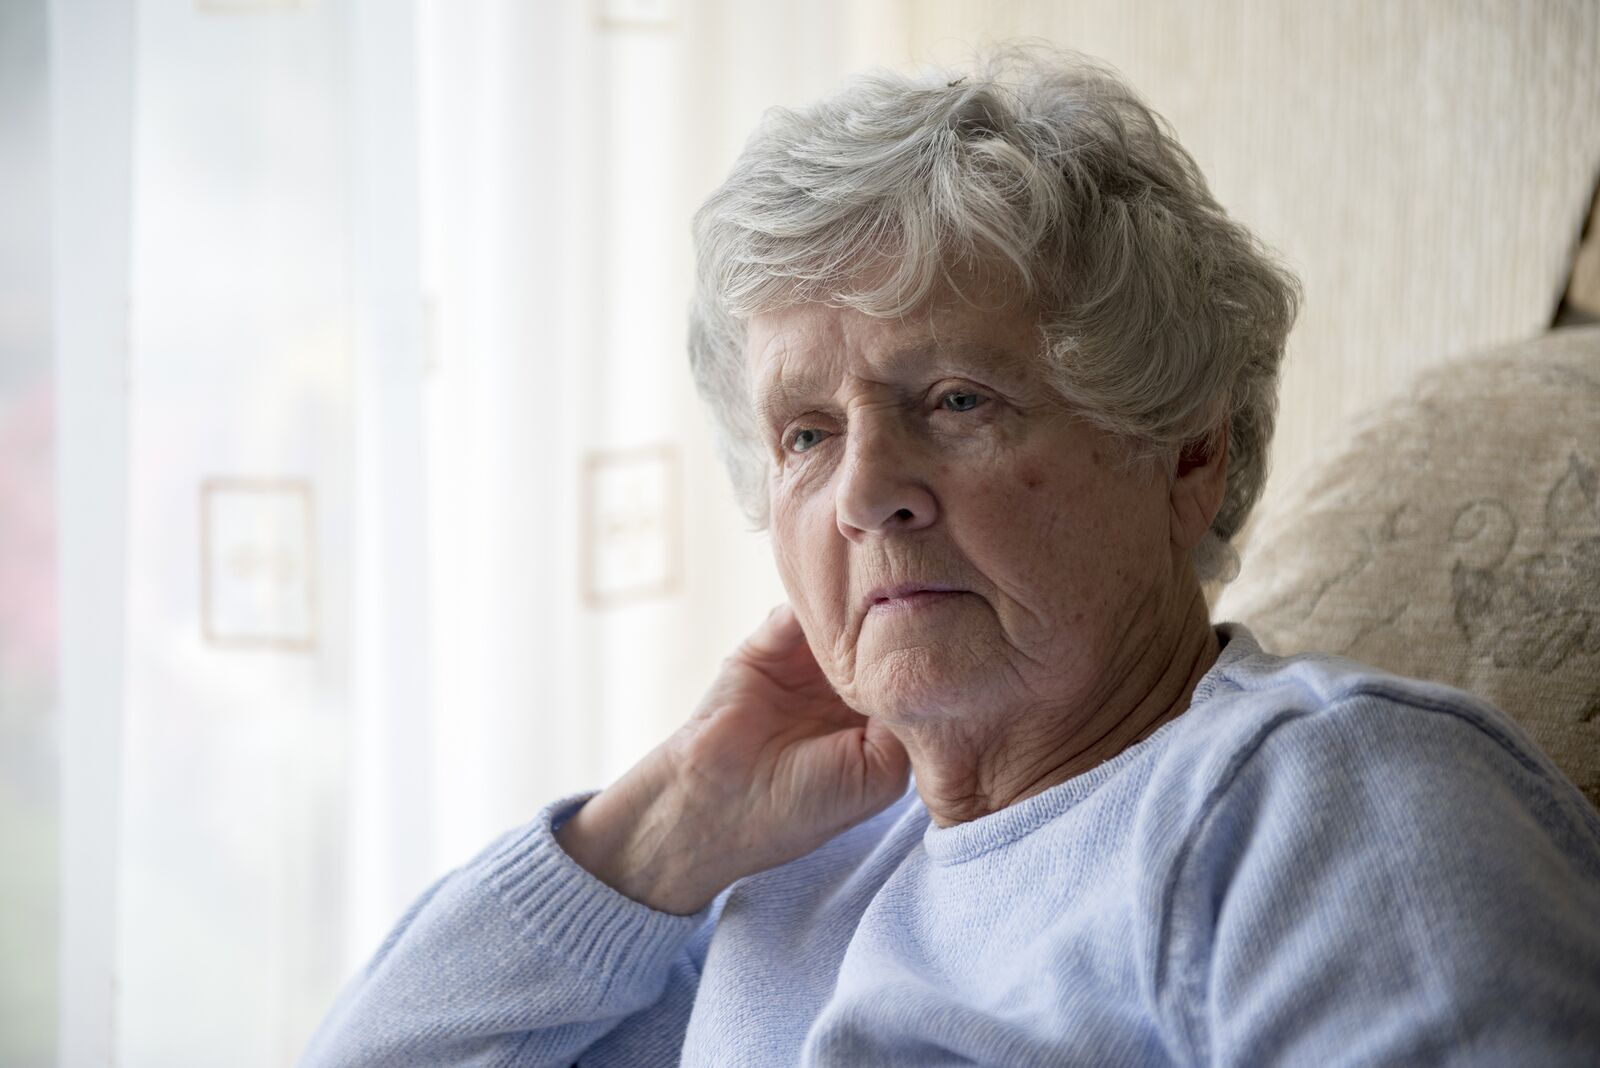 Home Health Care in Costa Mesa CA: Senior Dementia and Repetitive Questions